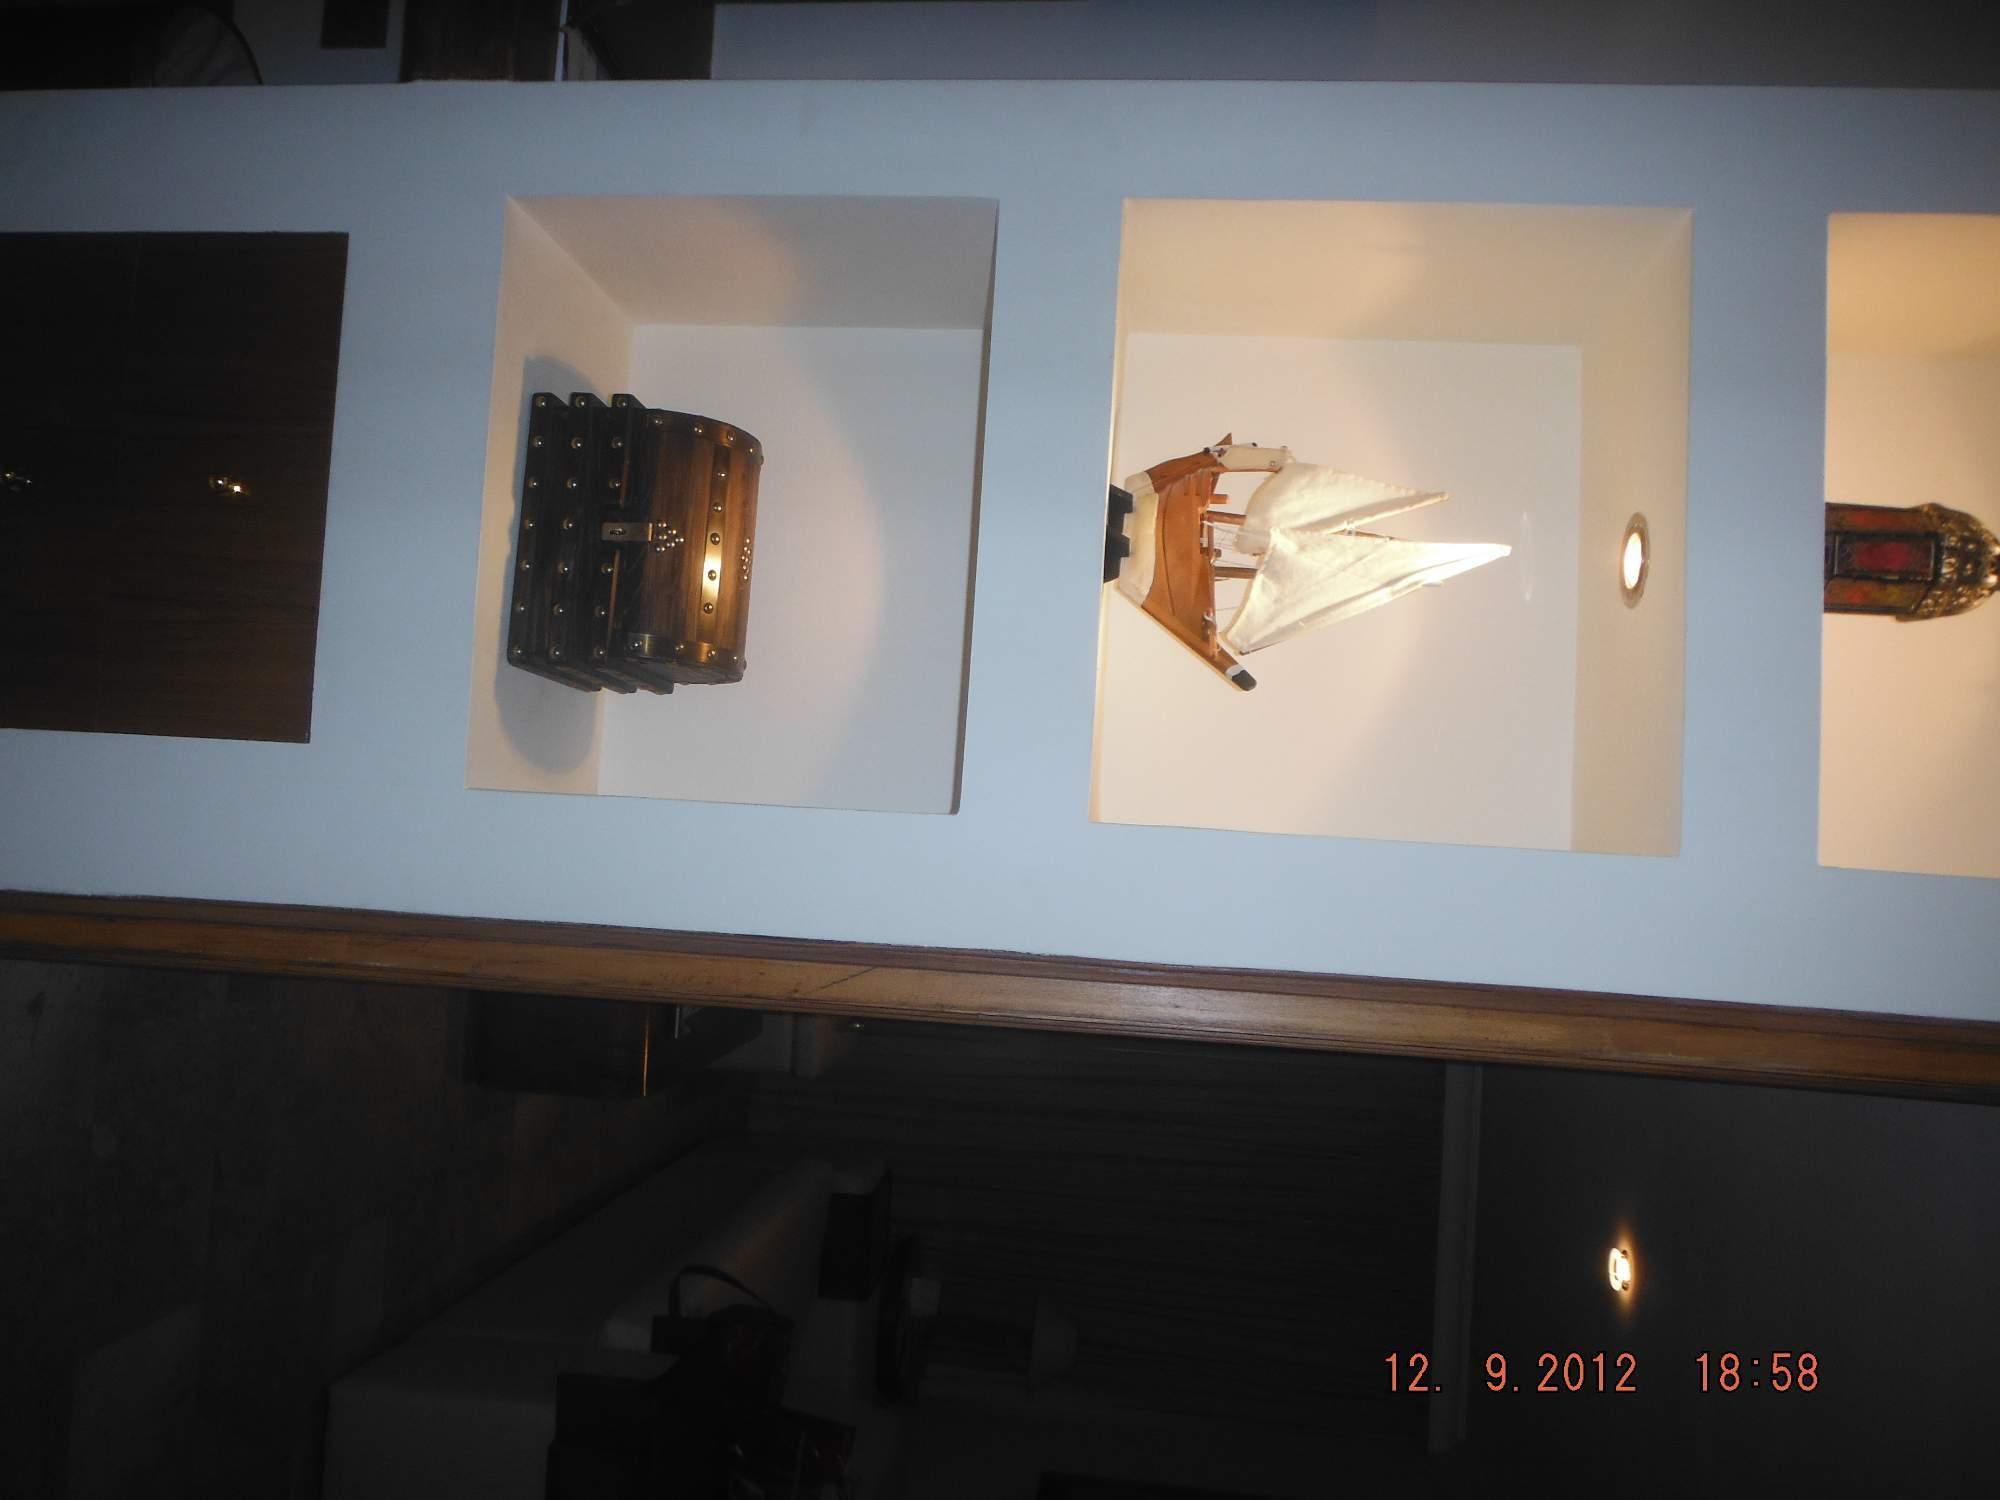 http://img24.rajce.idnes.cz/d2403/13/13214/13214242_a1e43f49e51a1daa7632f800d4edae3f/images/SAE008.jpg